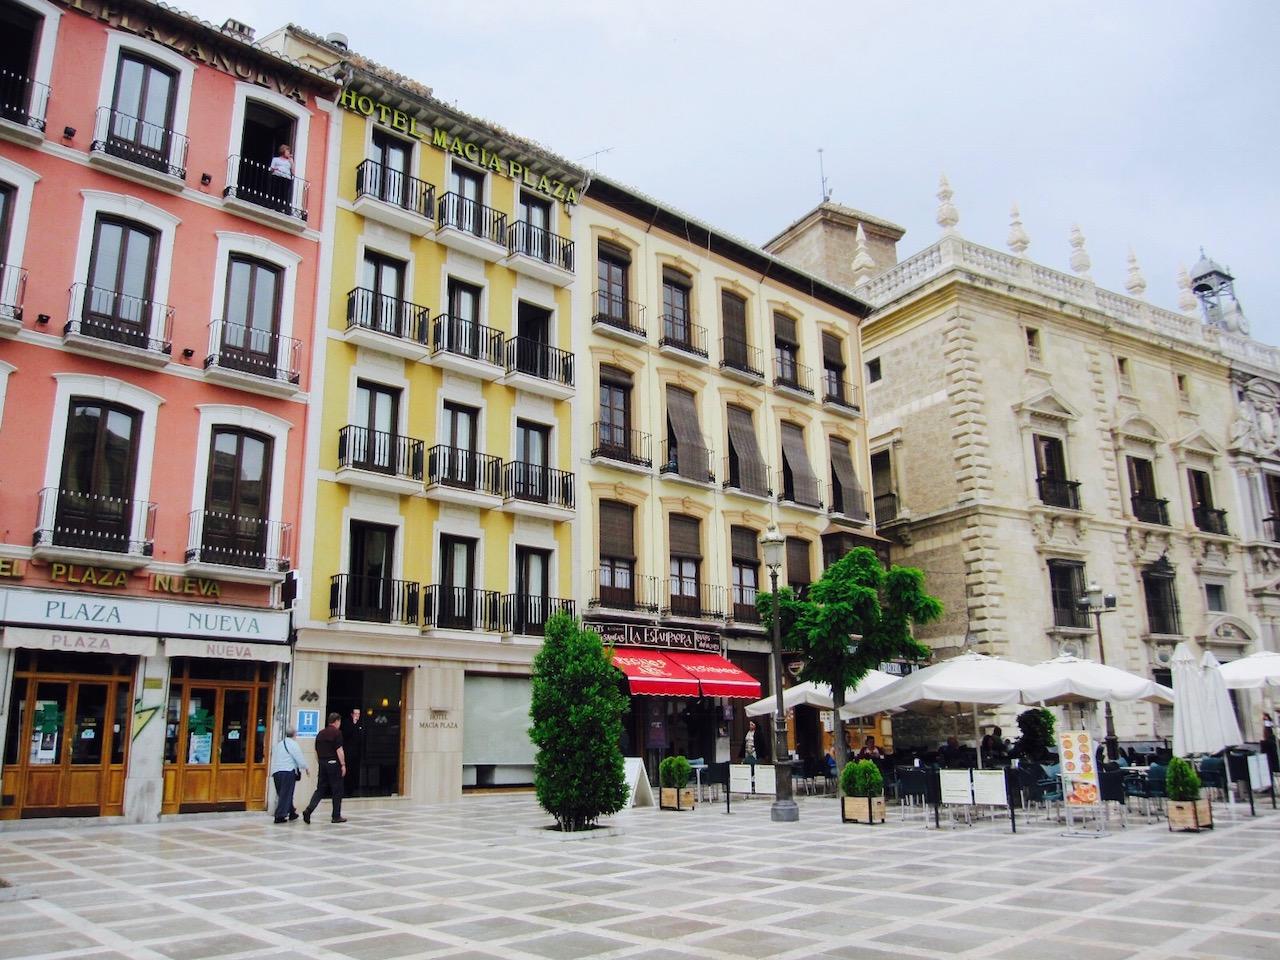 Hotel Macia Plaza am Plaza Nueve, Granada, Andalusien